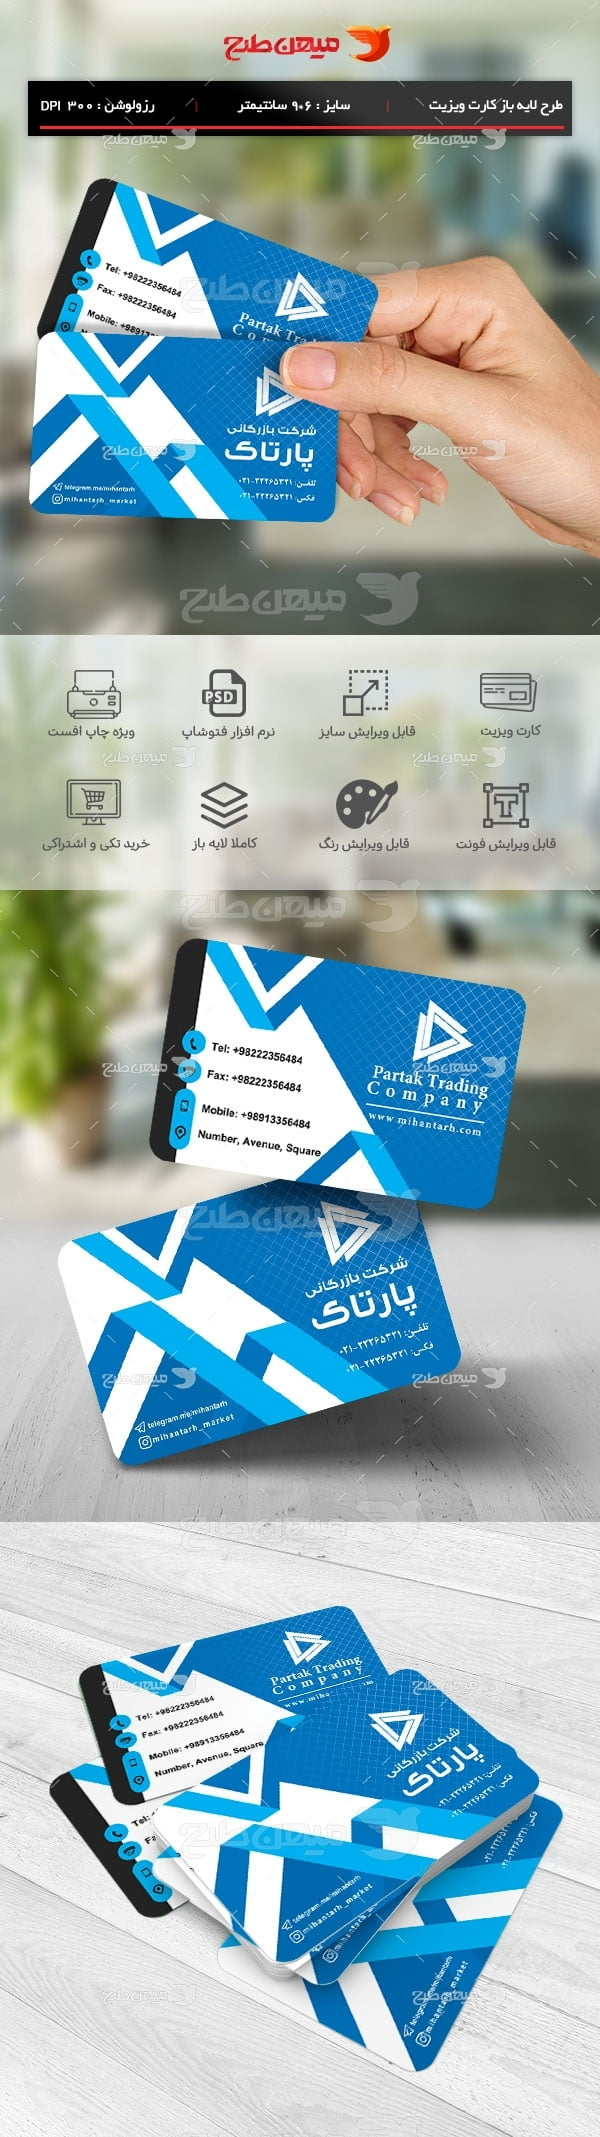 طرح لایه باز کارت ویزیت شرکتی